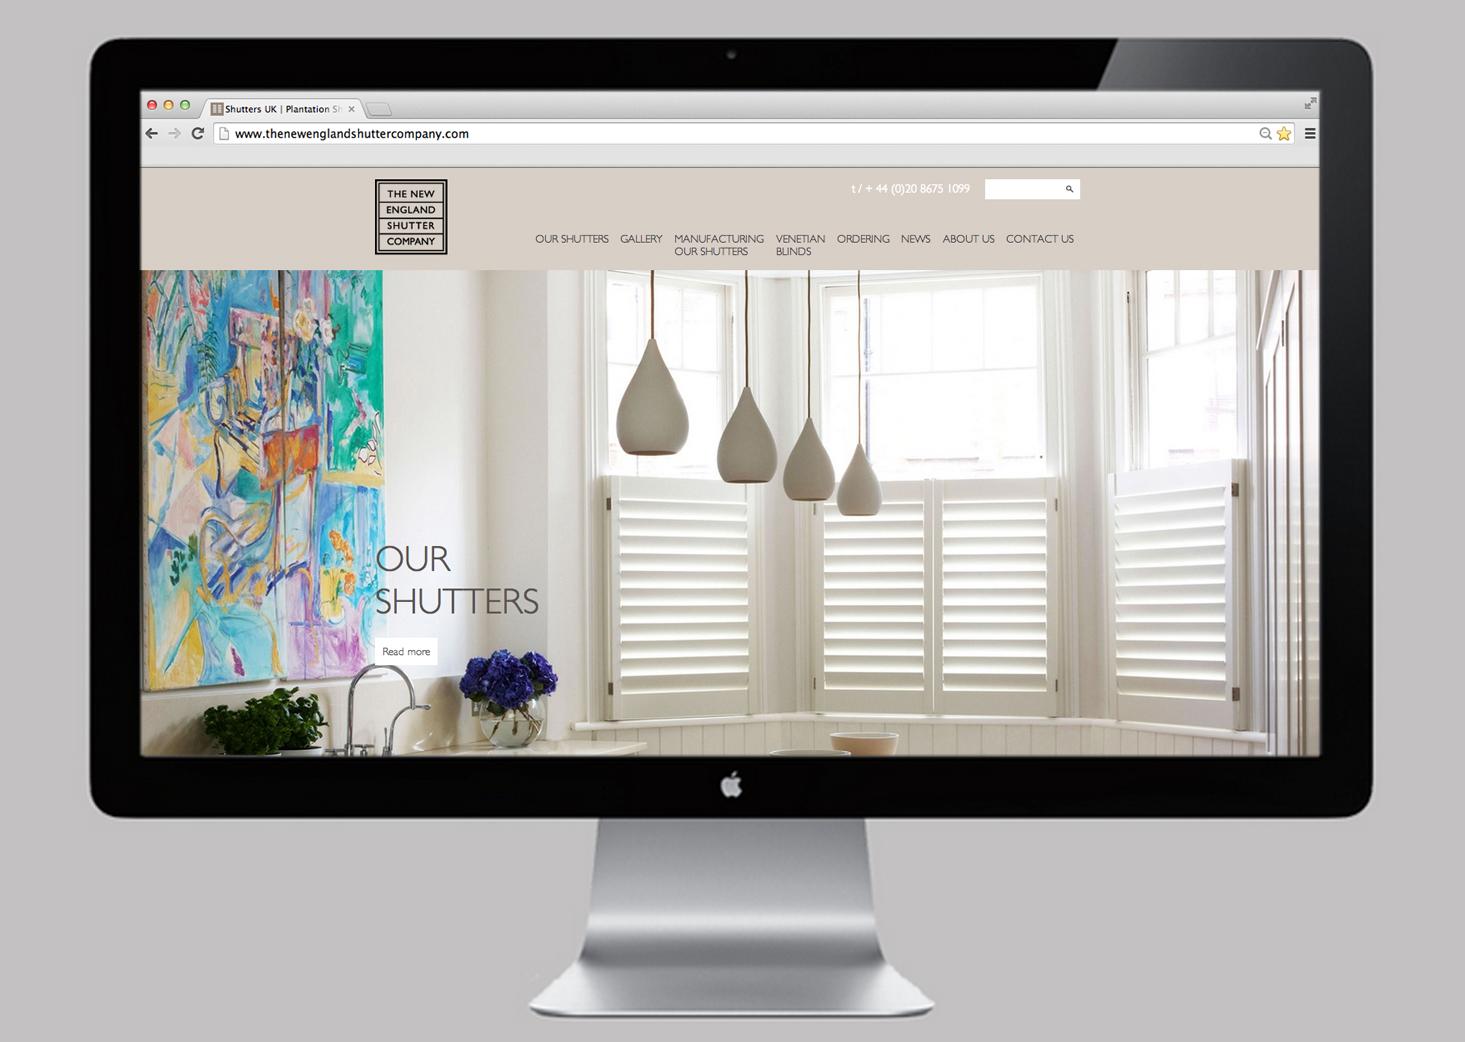 The New England Shutter Company Website